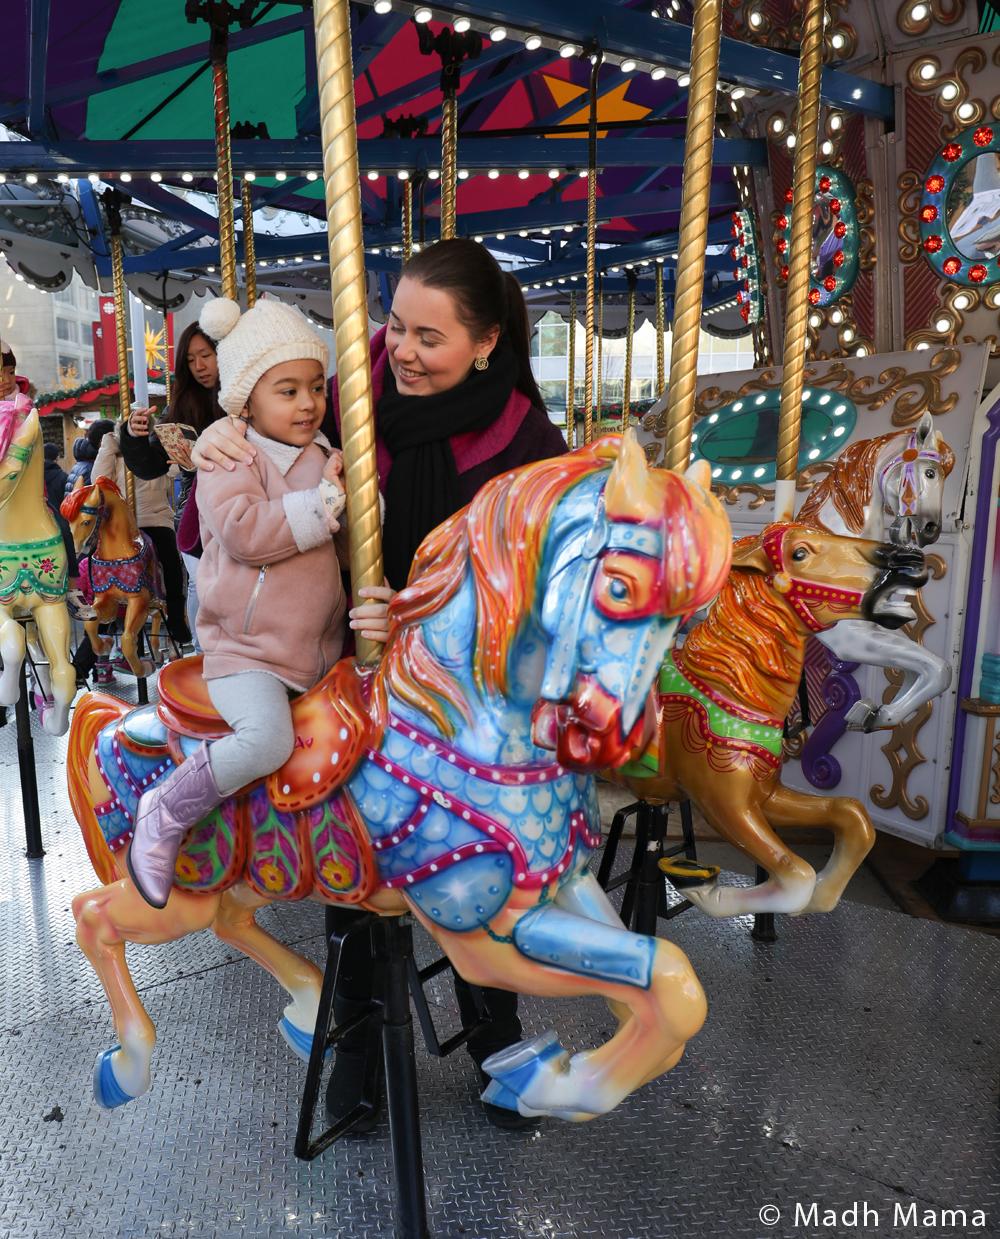 Brc Holiday Celebration Photos 2015: Our Christmas Celebrations (part 1)